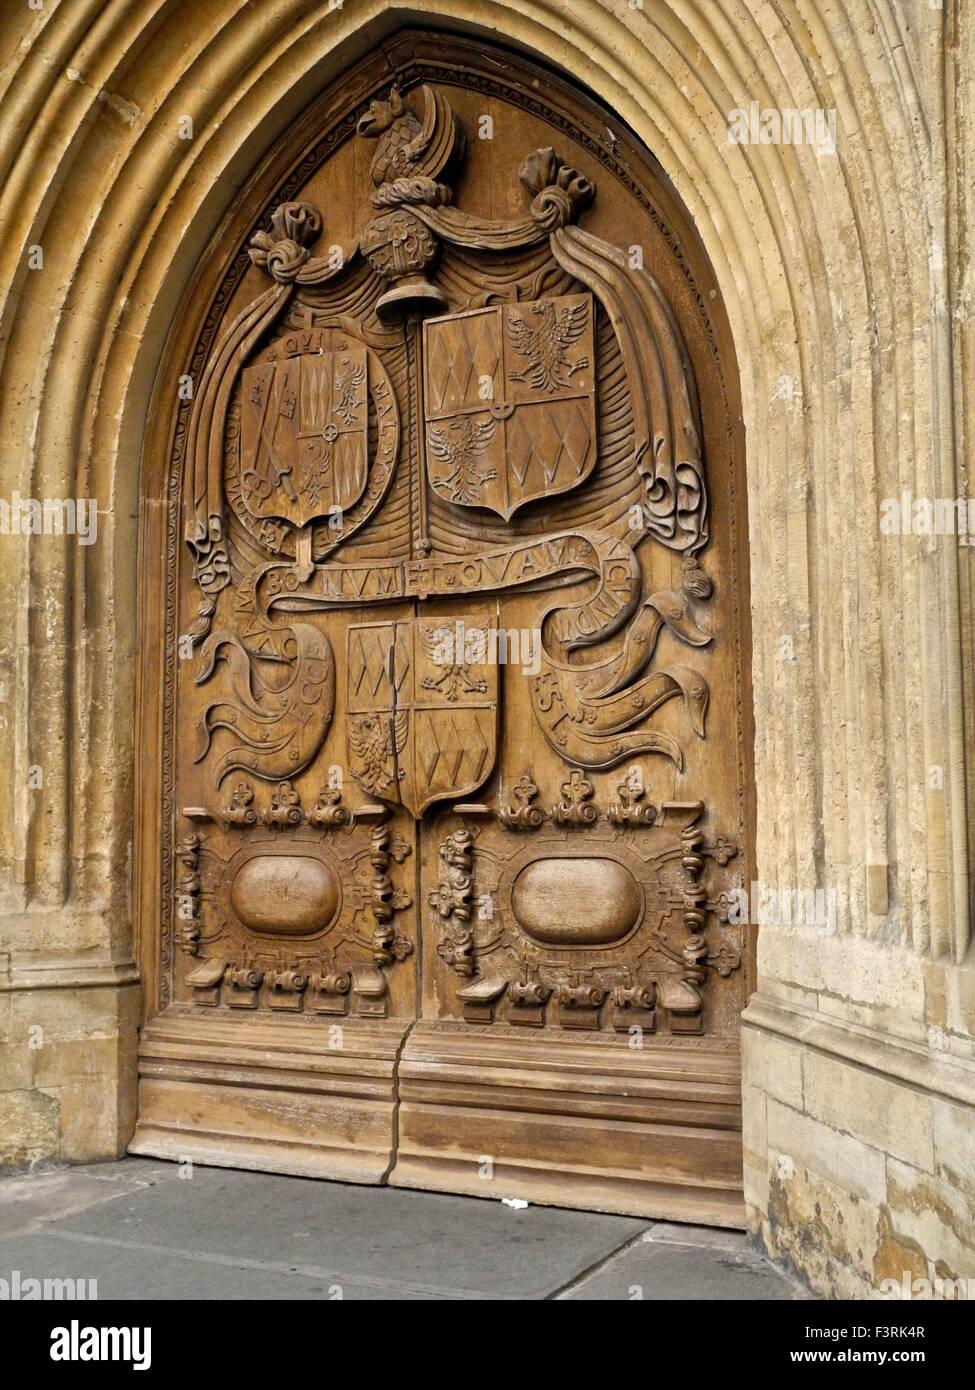 The West Door of Bath Abbey - Stock Image